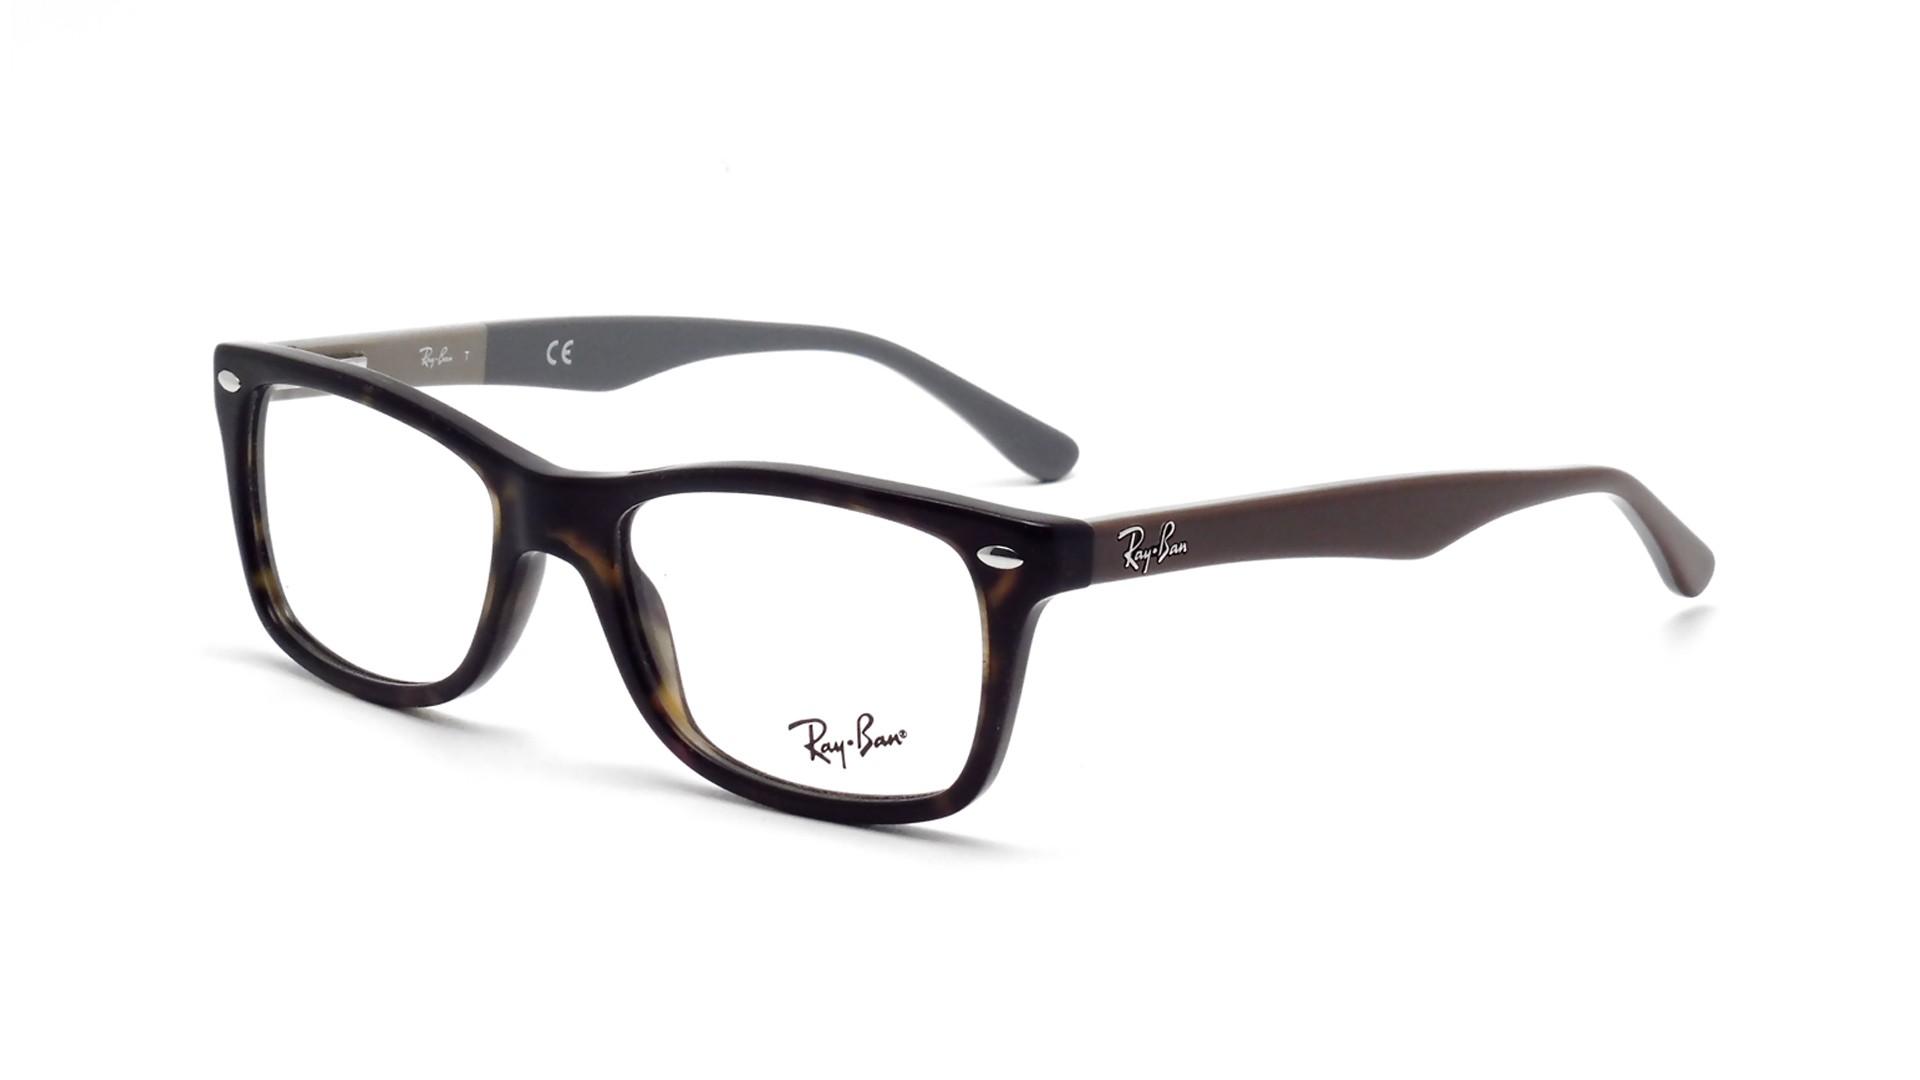 a089753cf5 Eyeglasses Ray-Ban RX5228 RB5228 5545 50-17 Tortoise Medium